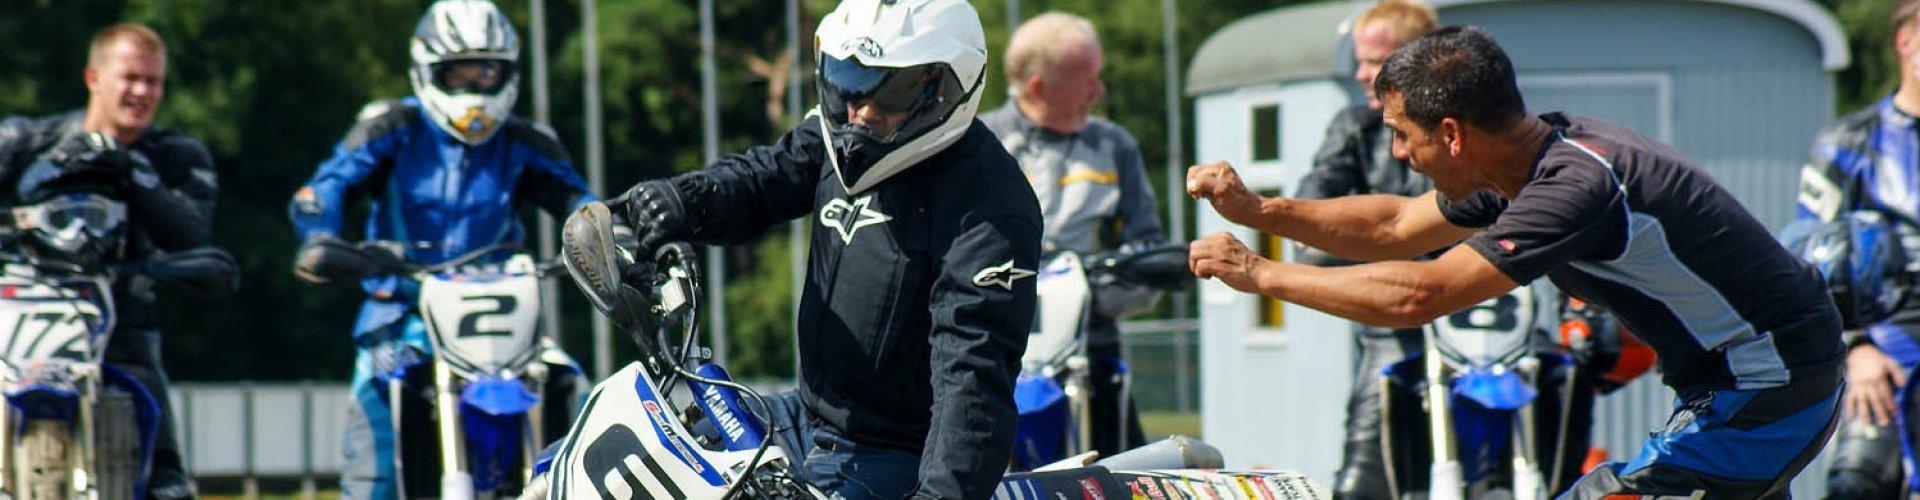 Cadeau moto circuit inclusief Yamaha WR450 huur motor